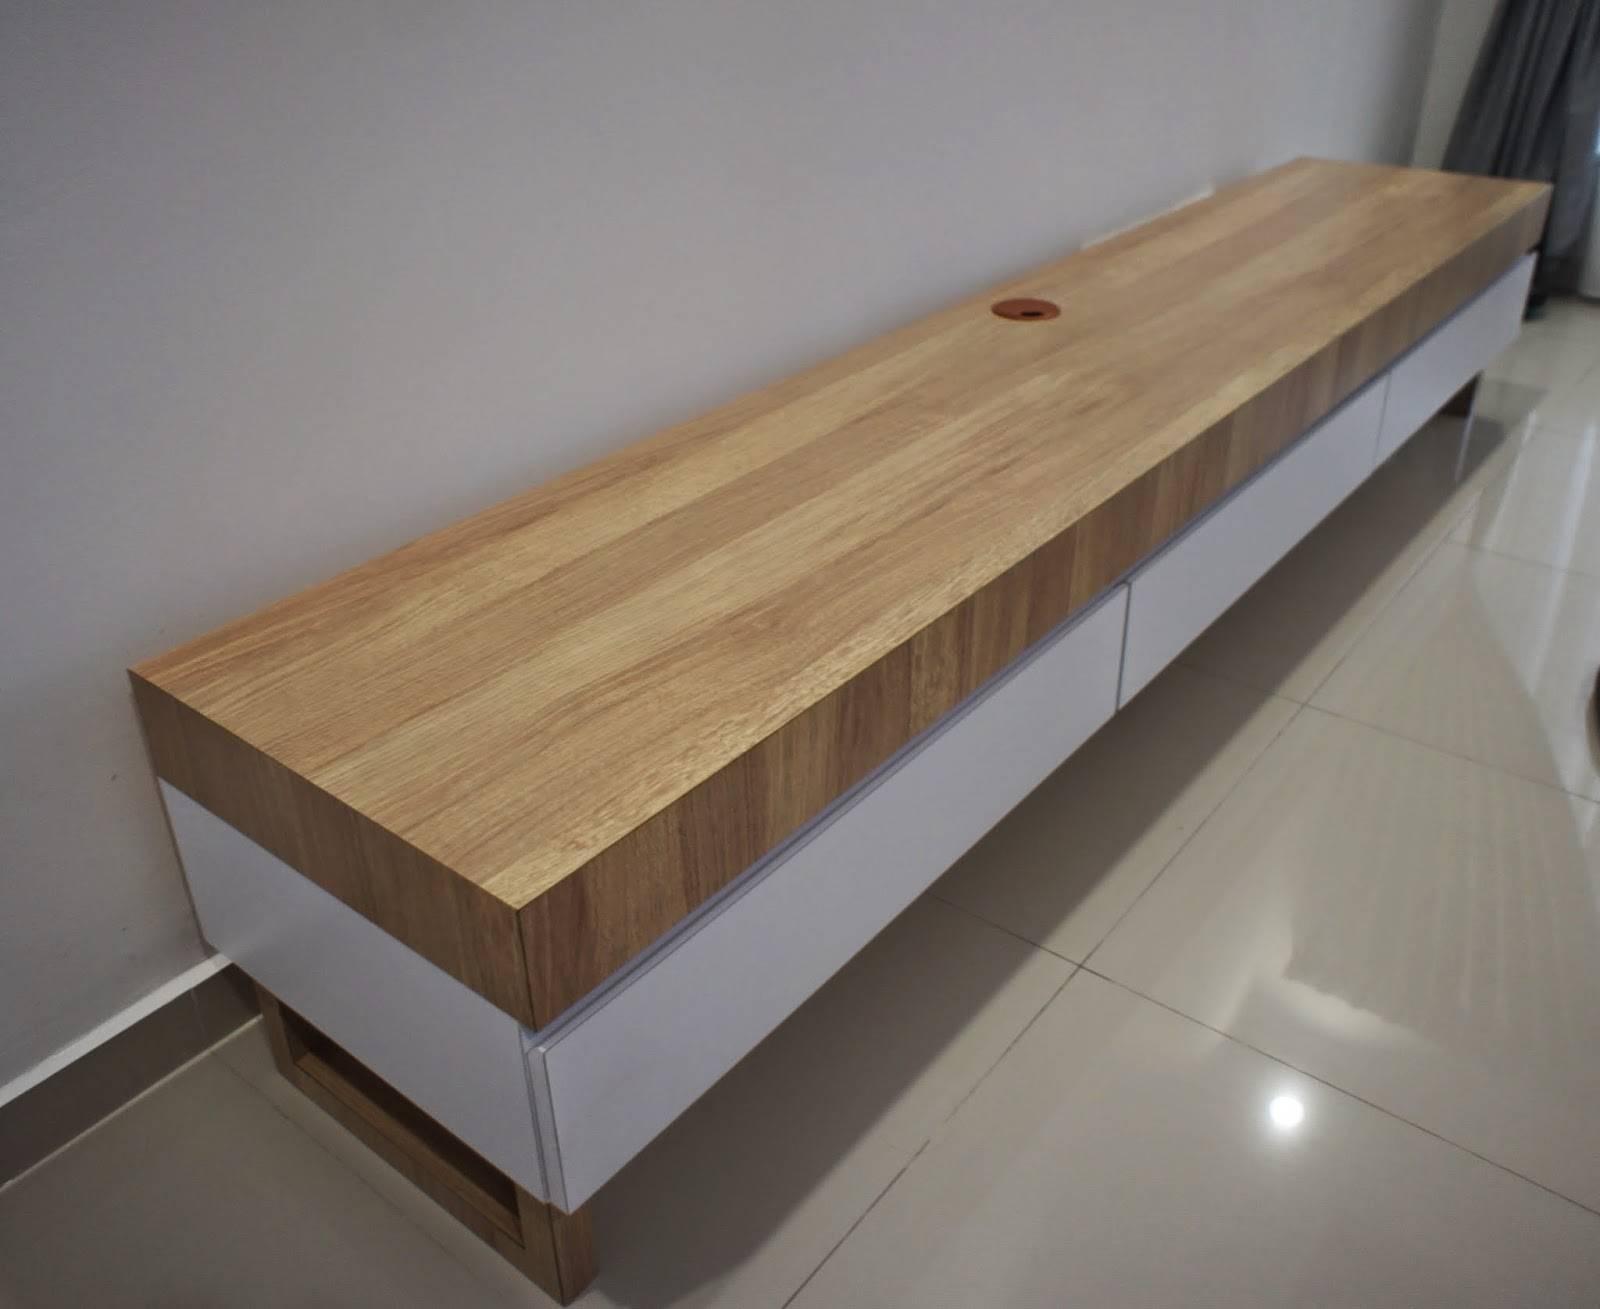 Fukusu: Scandinavian Design Tv Cabinet And Study Table In Awesome in Scandinavian Design Tv Cabinets (Image 7 of 15)